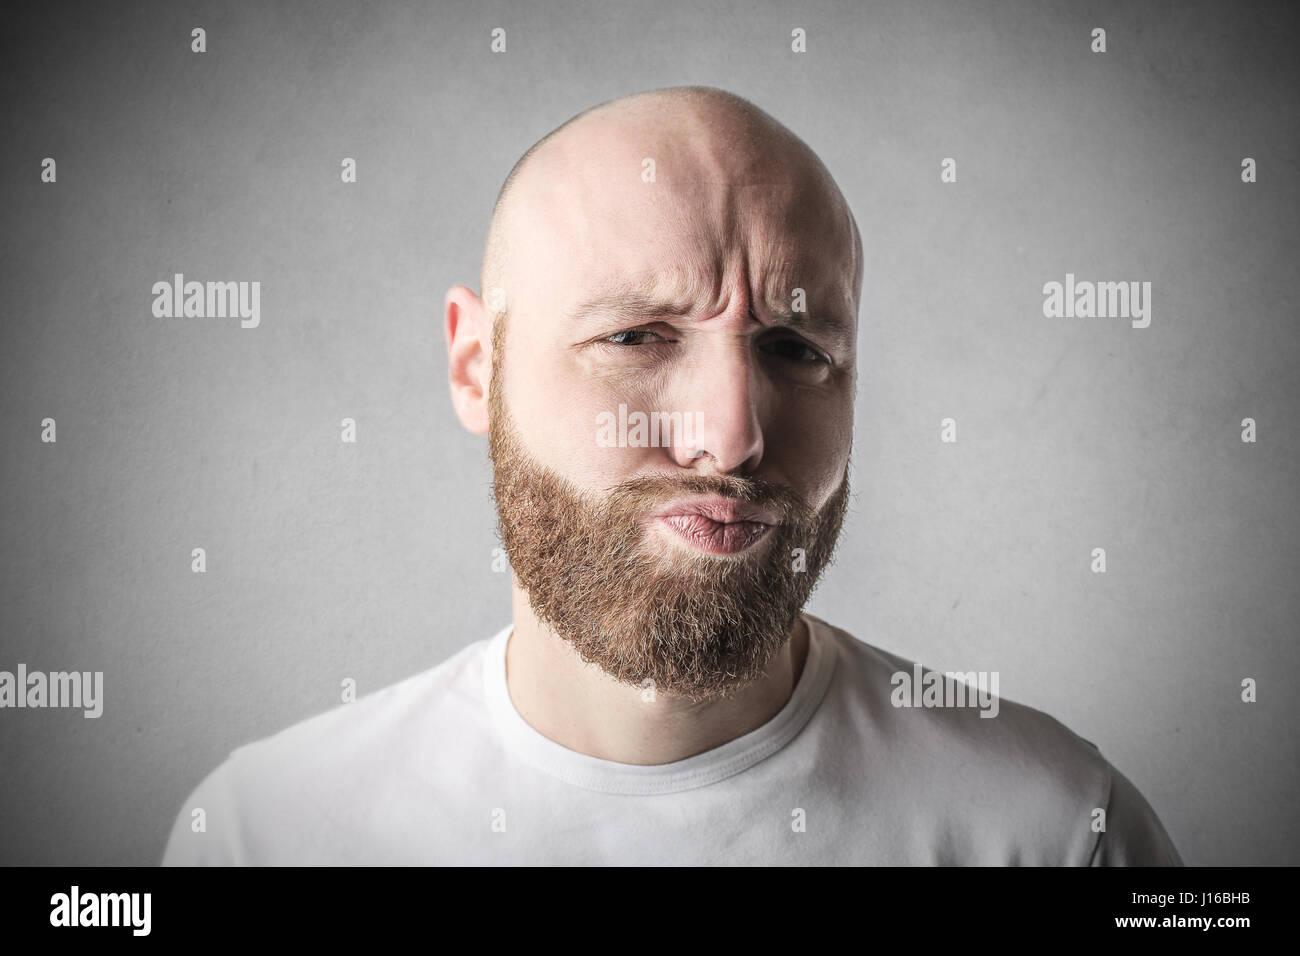 Bearded man making grimace - Stock Image